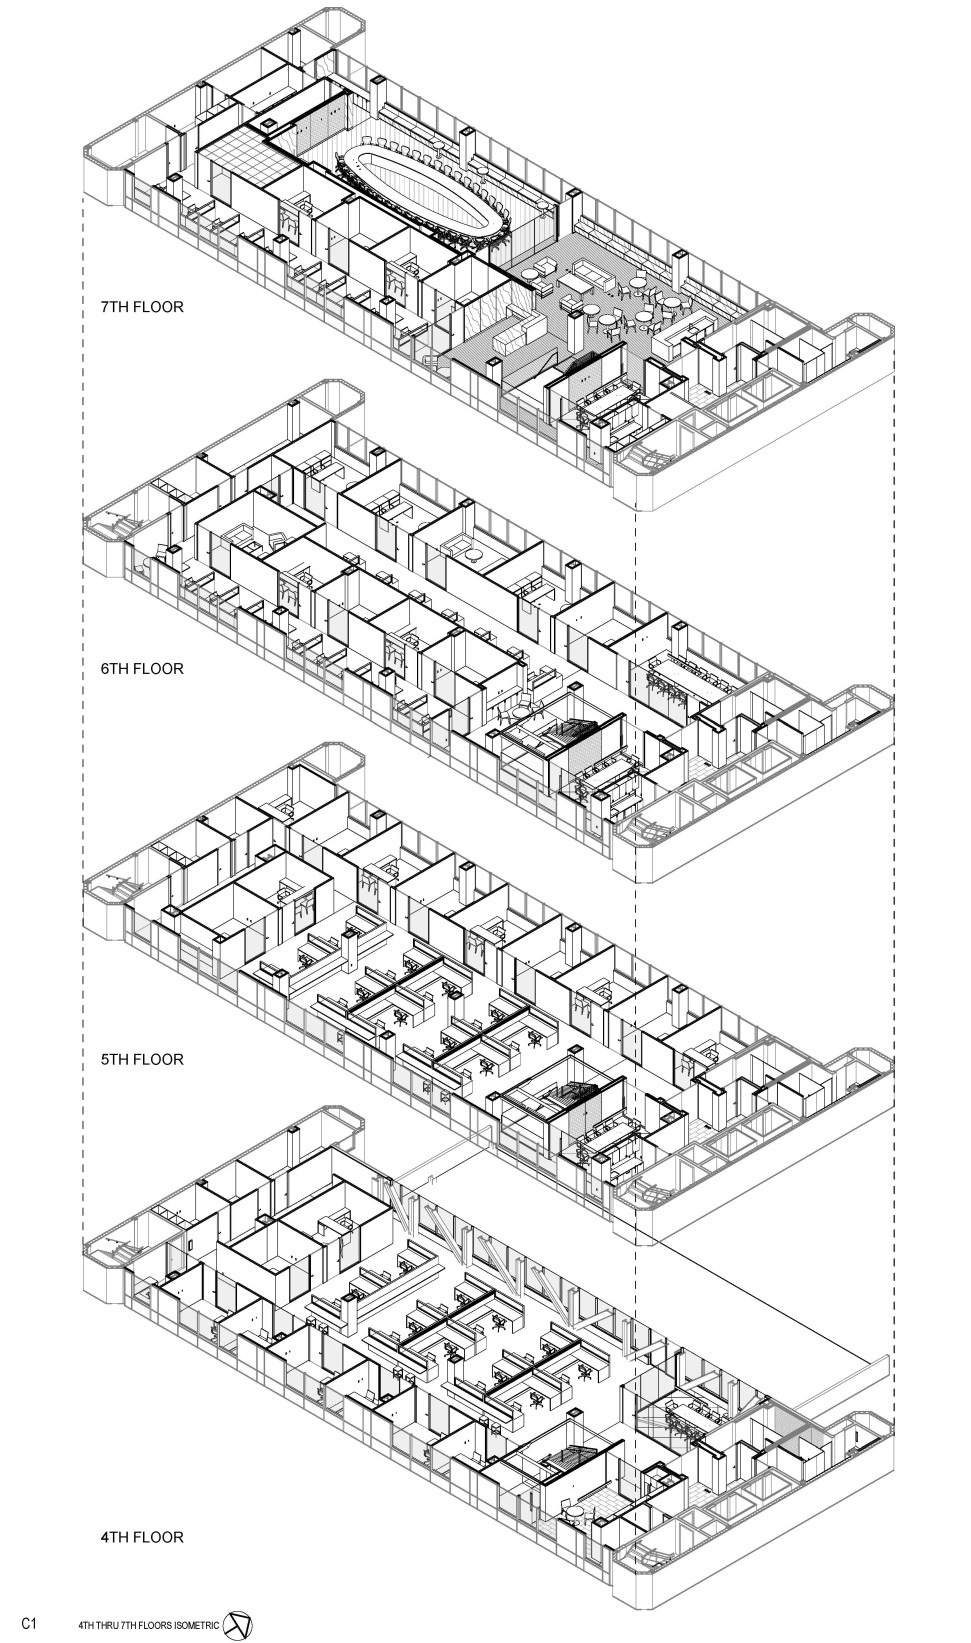 Exploded Isometric of Floors 4-7